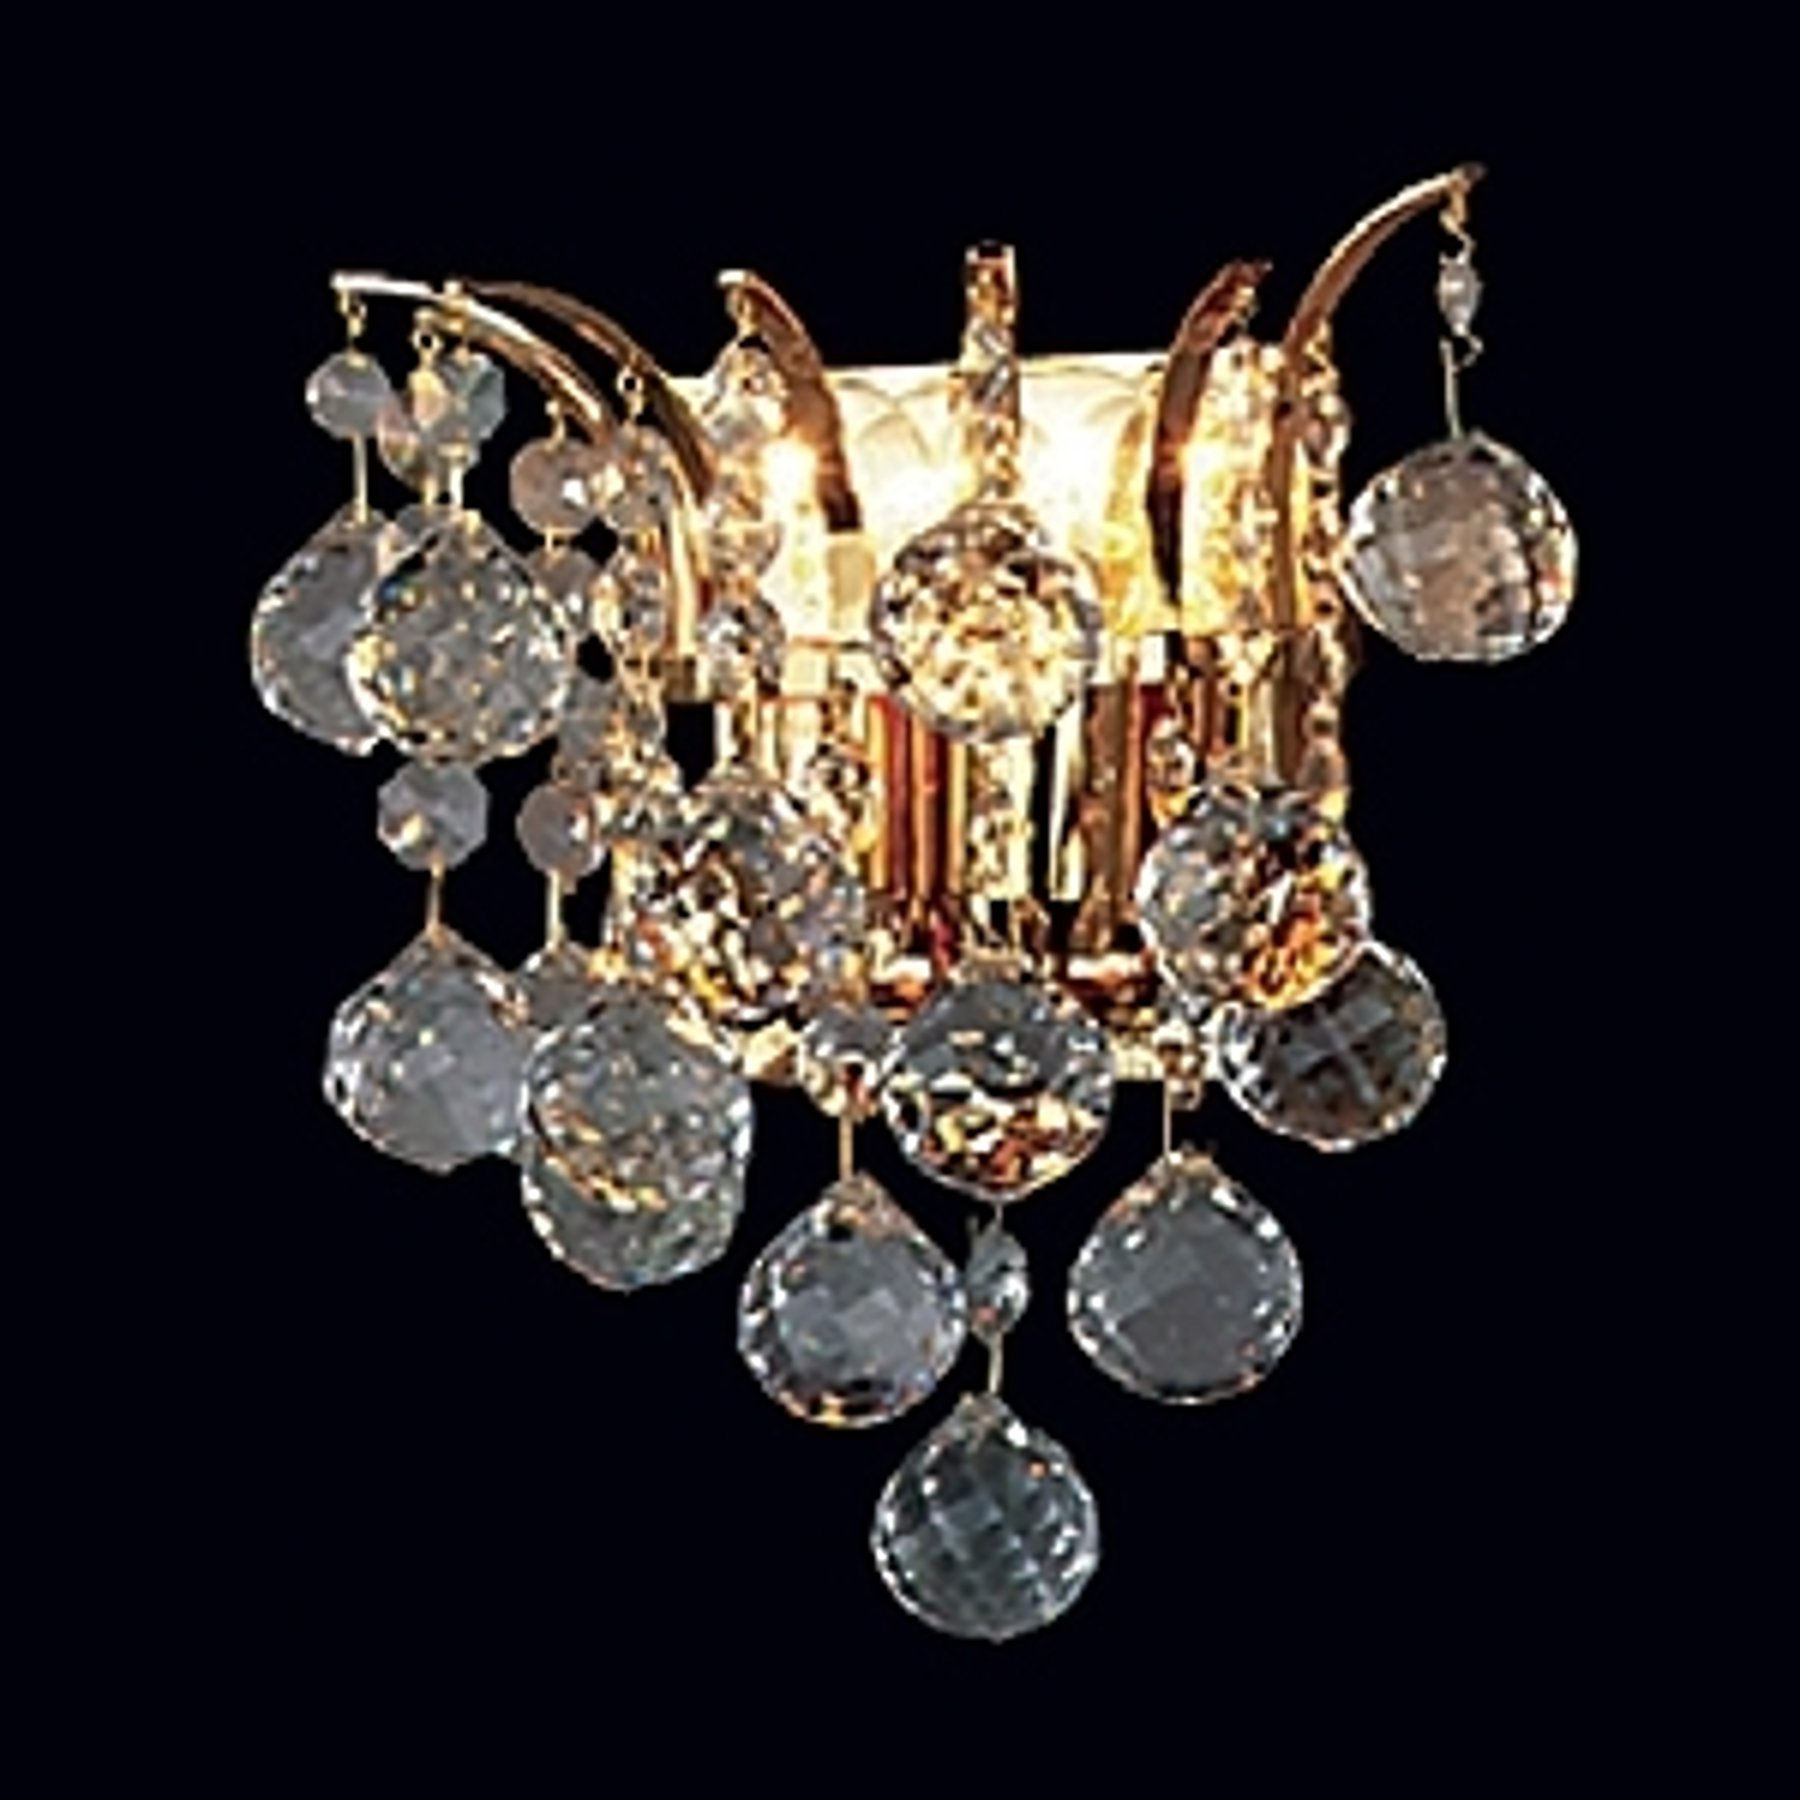 LENNARDA krystallvegglampe i gull